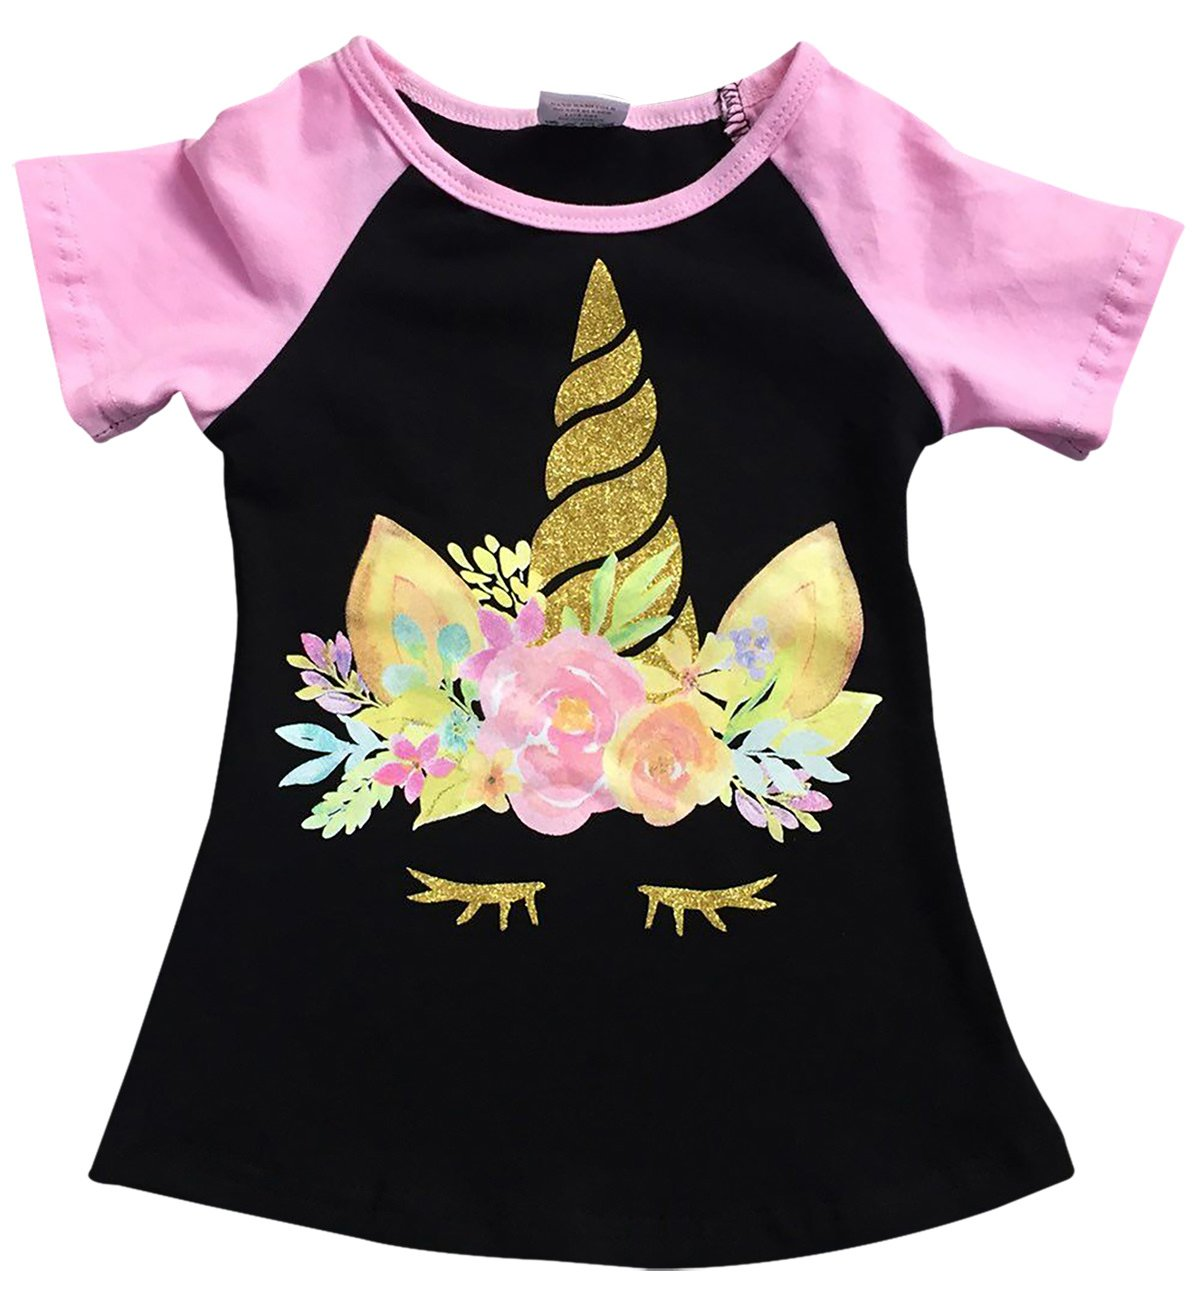 Dreamer P Big Girls' Short Sleeve Glitter Unicorn Floral Summer Raglan Top T-Shirt Tee Black 6 XL (P201508P)